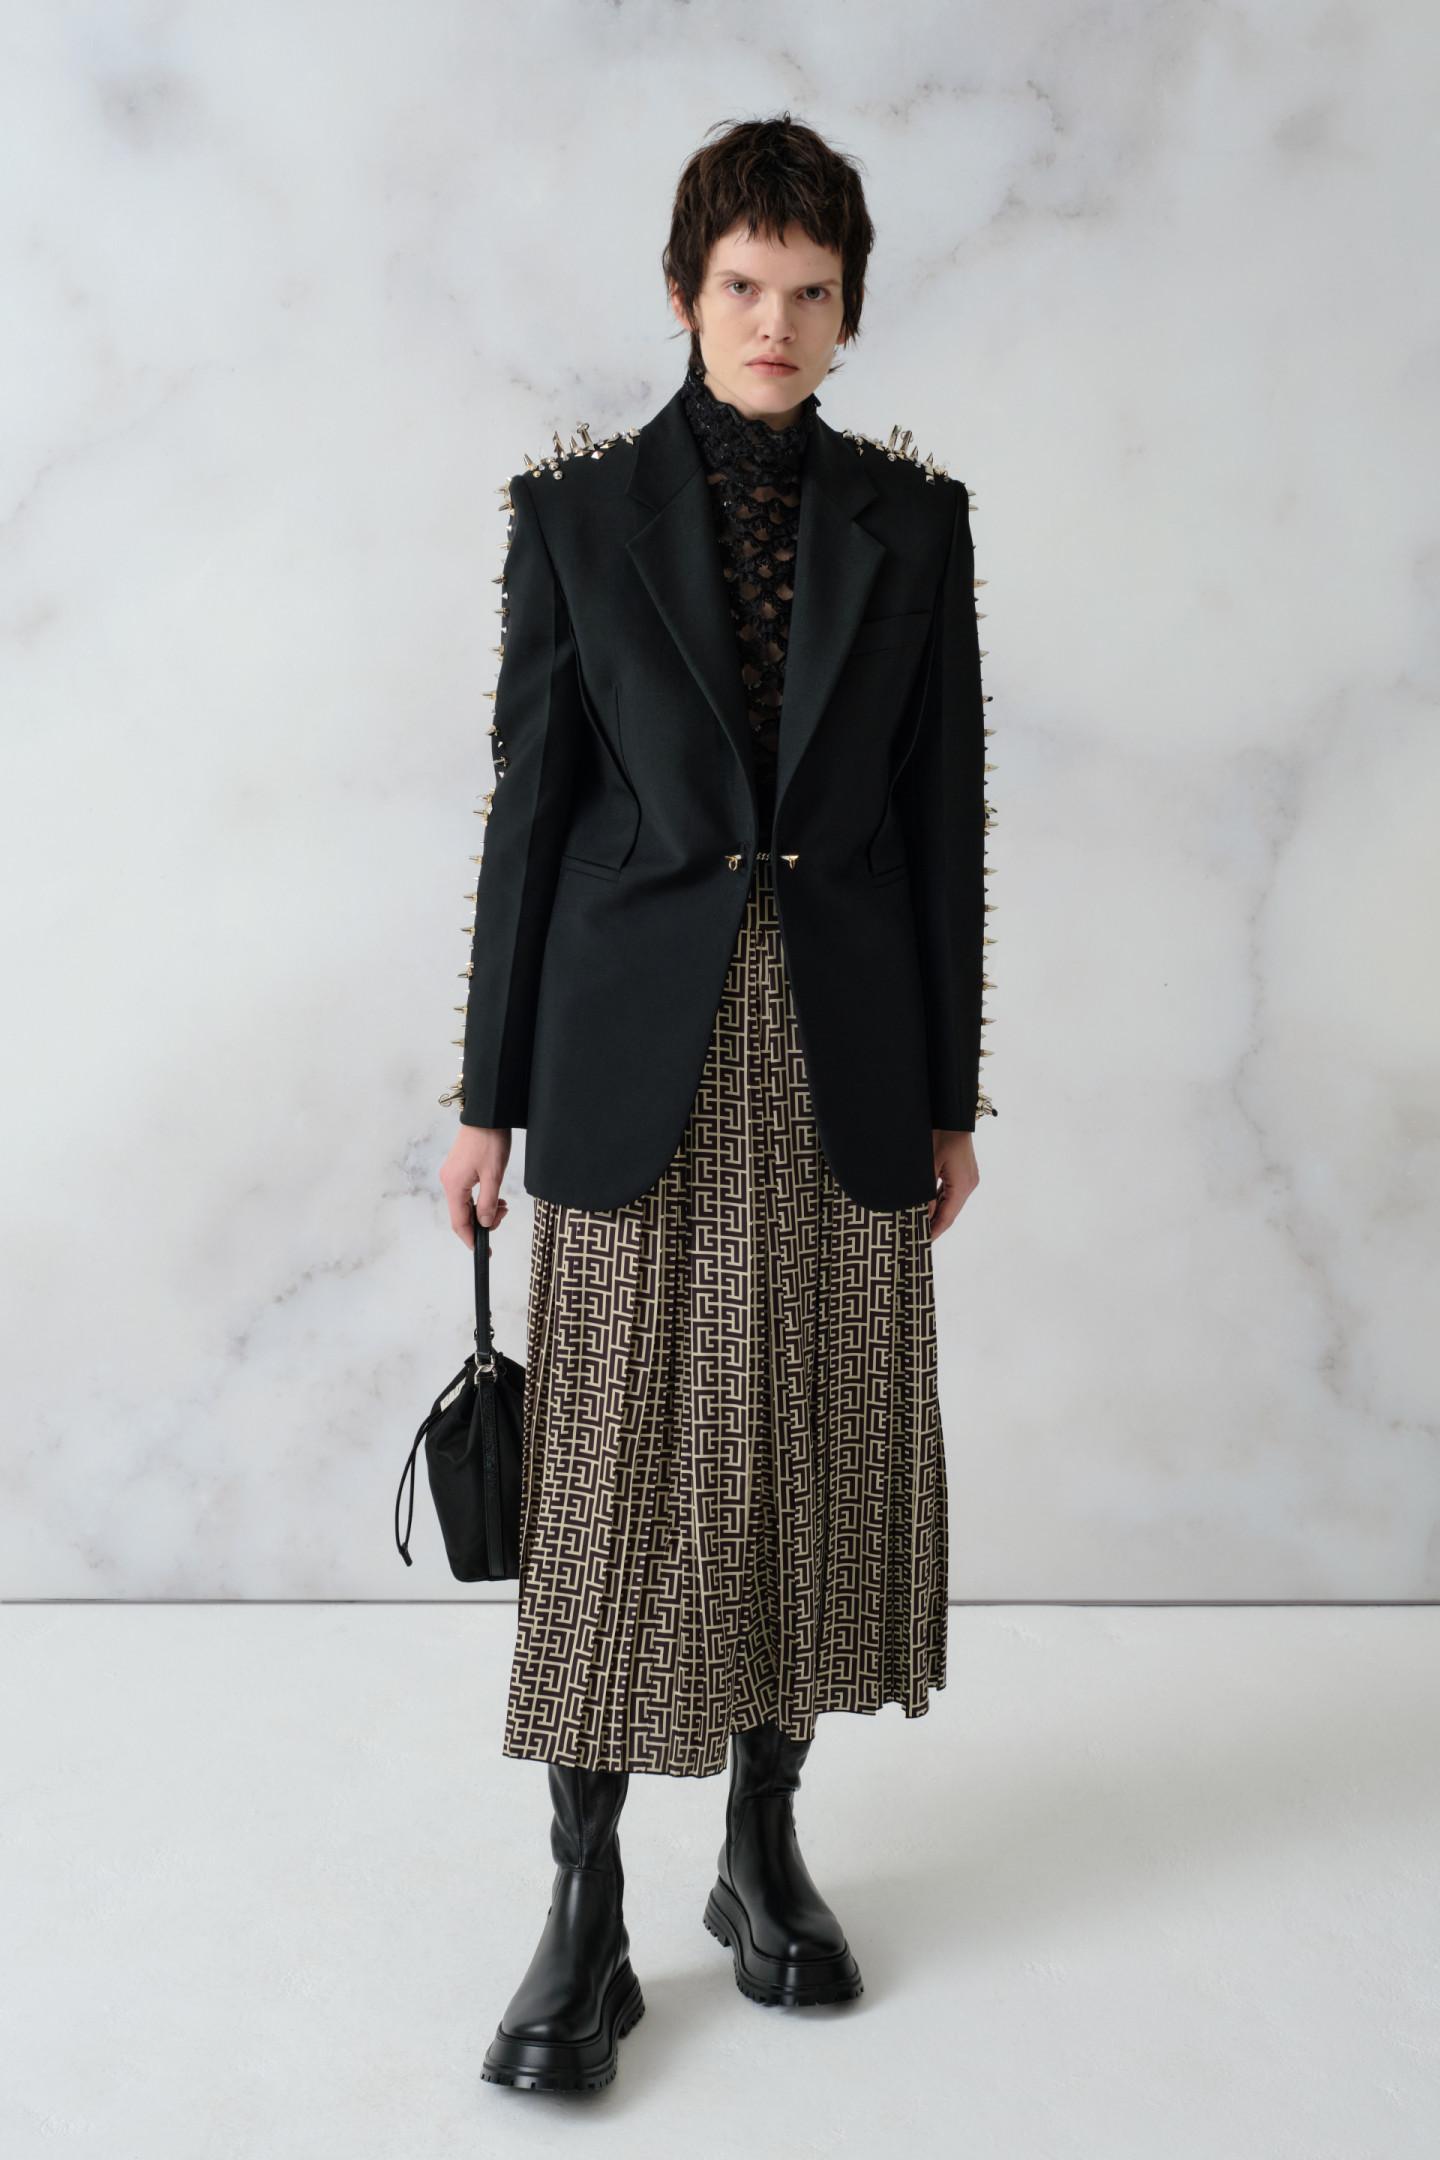 Жакет Givenchy, 324500 руб., Топ Valentino, 375500 руб., кюлоты Balmain, 231000 руб., сумка 4G Light, Givenchy, 68500 руб., ботинки Hurr, Burberry, 83900 руб.